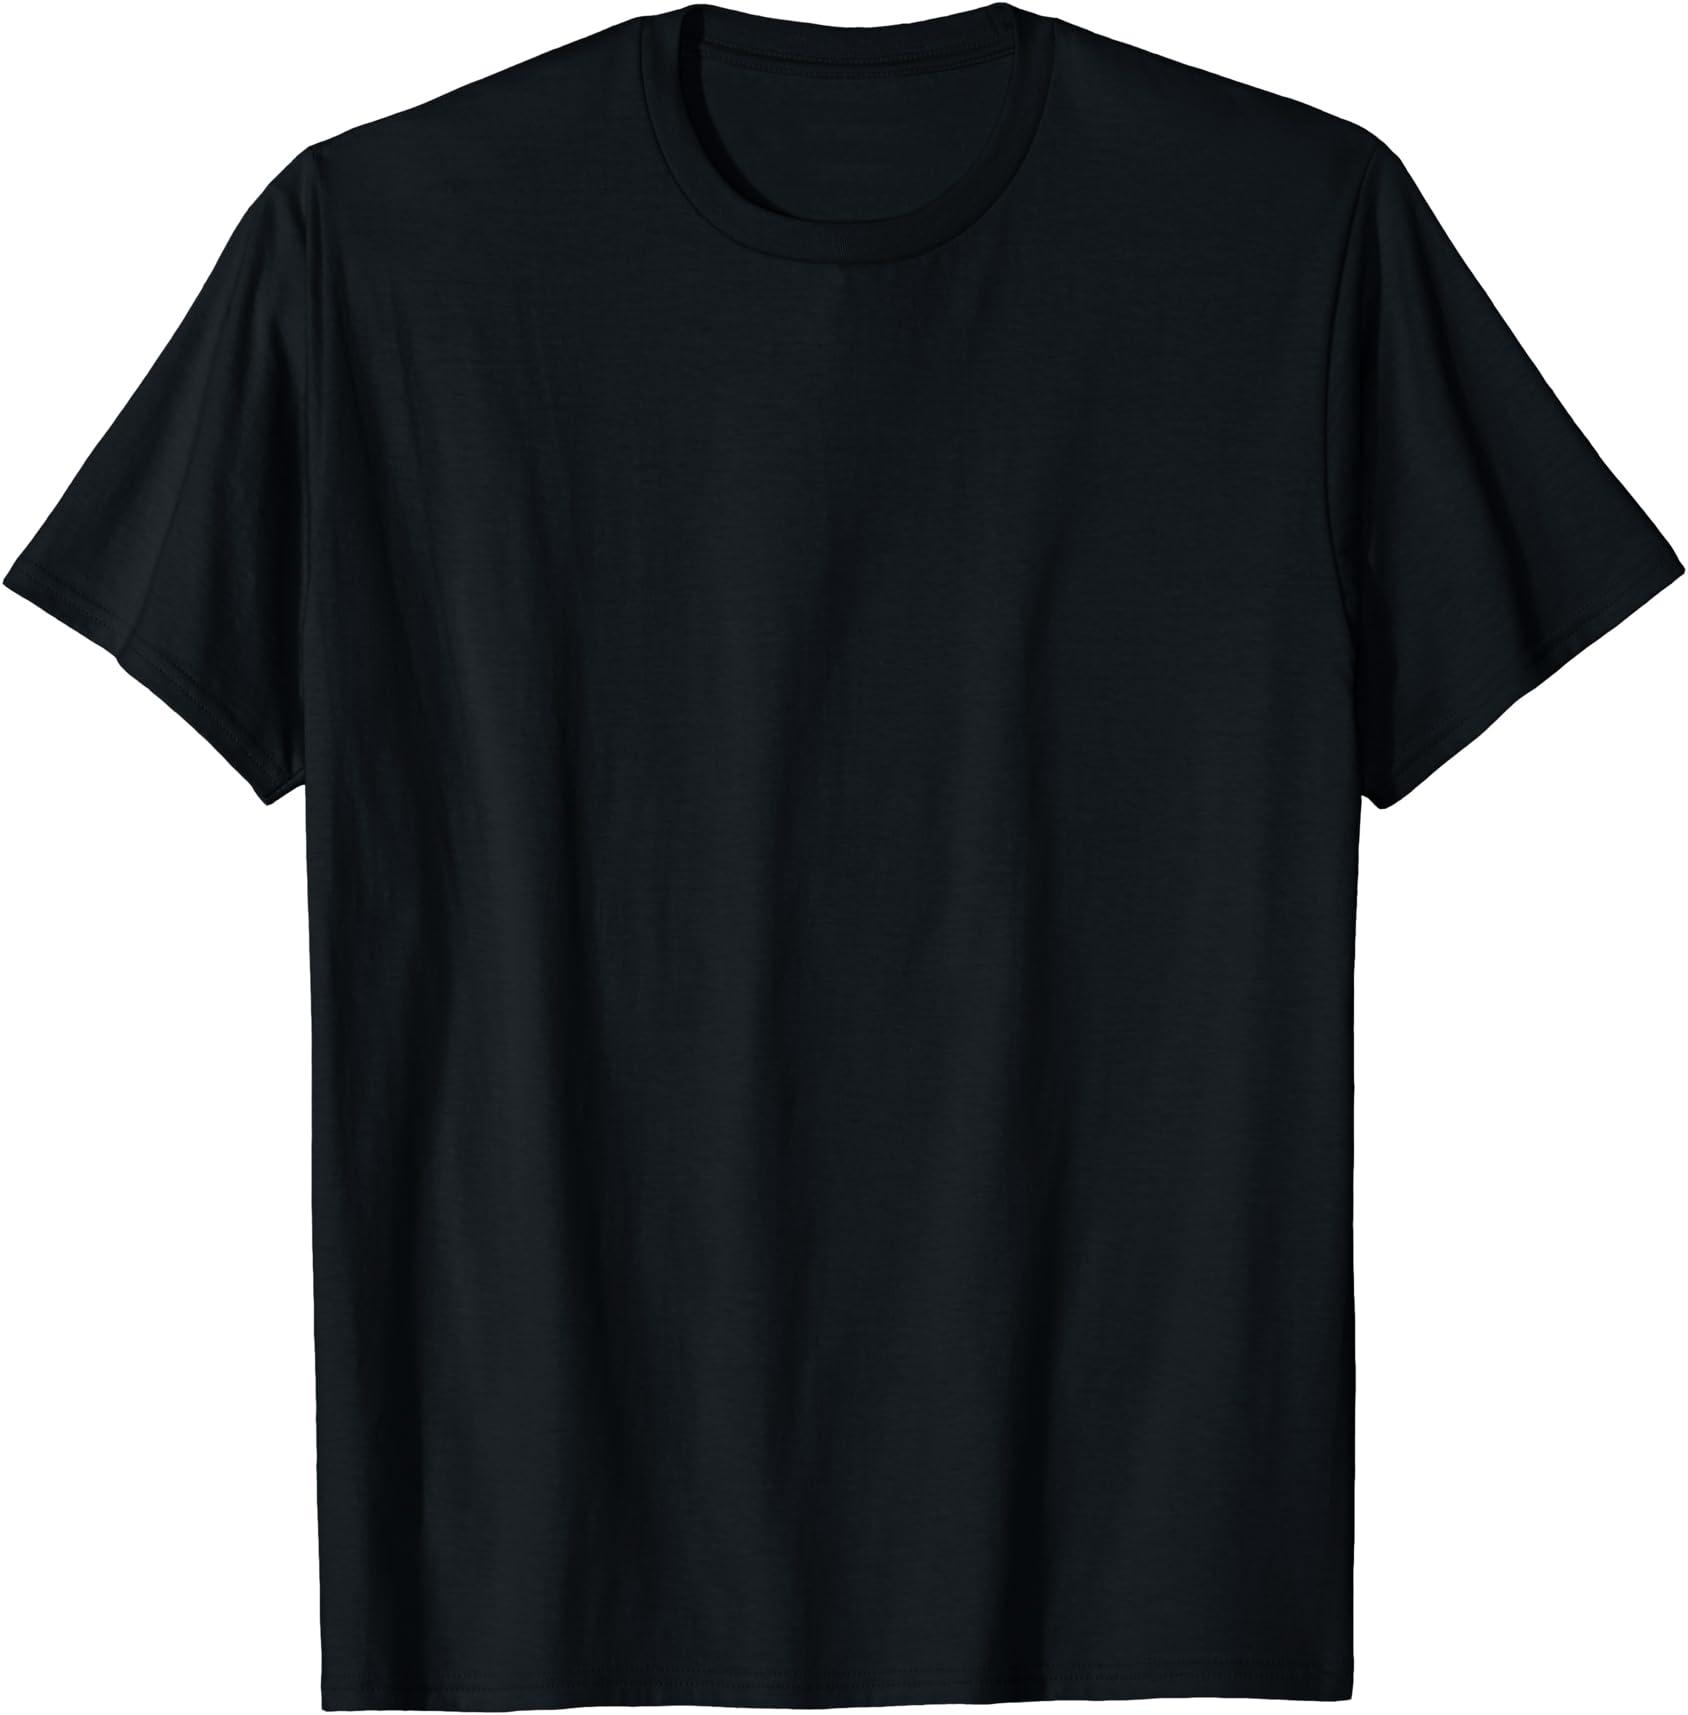 Dobre Brothers T-shirt Tee Youtuber Kids Youth Children/'s Boys Girls Tie Dye